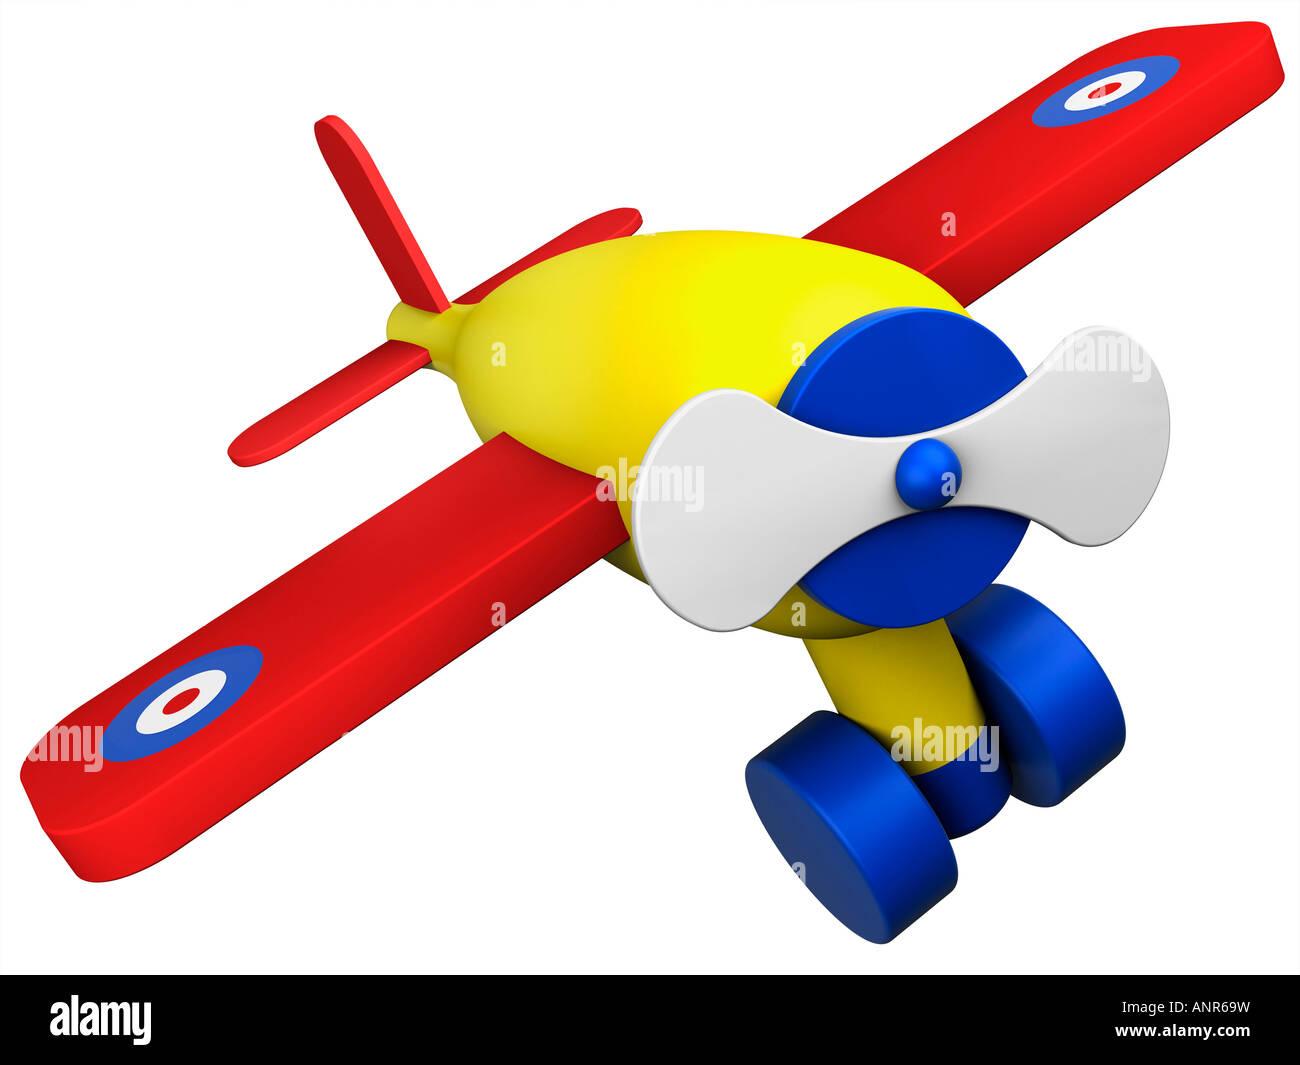 Toy wooden plane aeroplane airplane - Stock Image